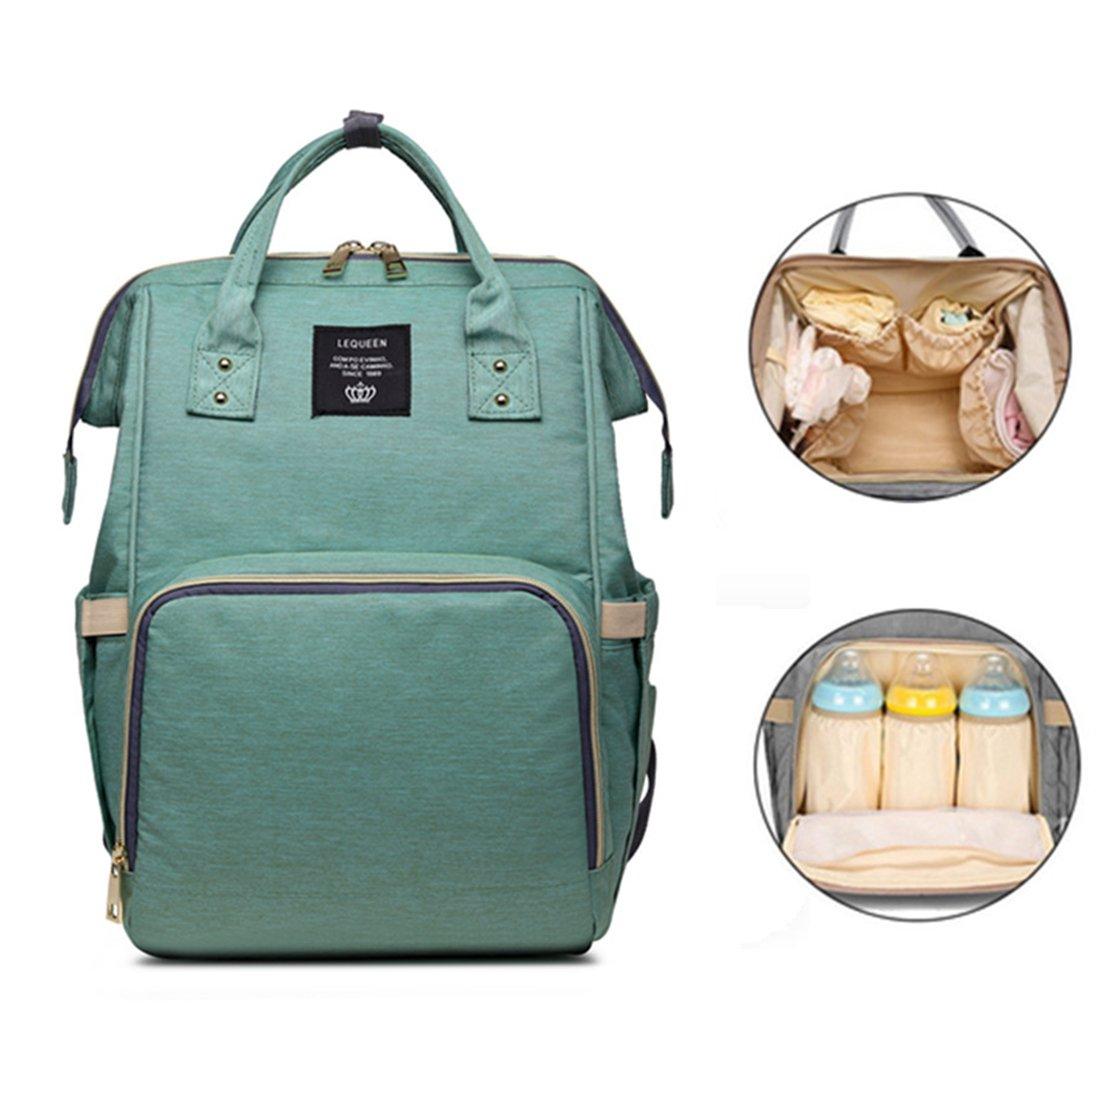 Diaper Bag Backpack Maternity Mommy Nappy Bag Double-shoulder Backpack Mother & Kids Stroller Pram Bags Waterproof Light Green